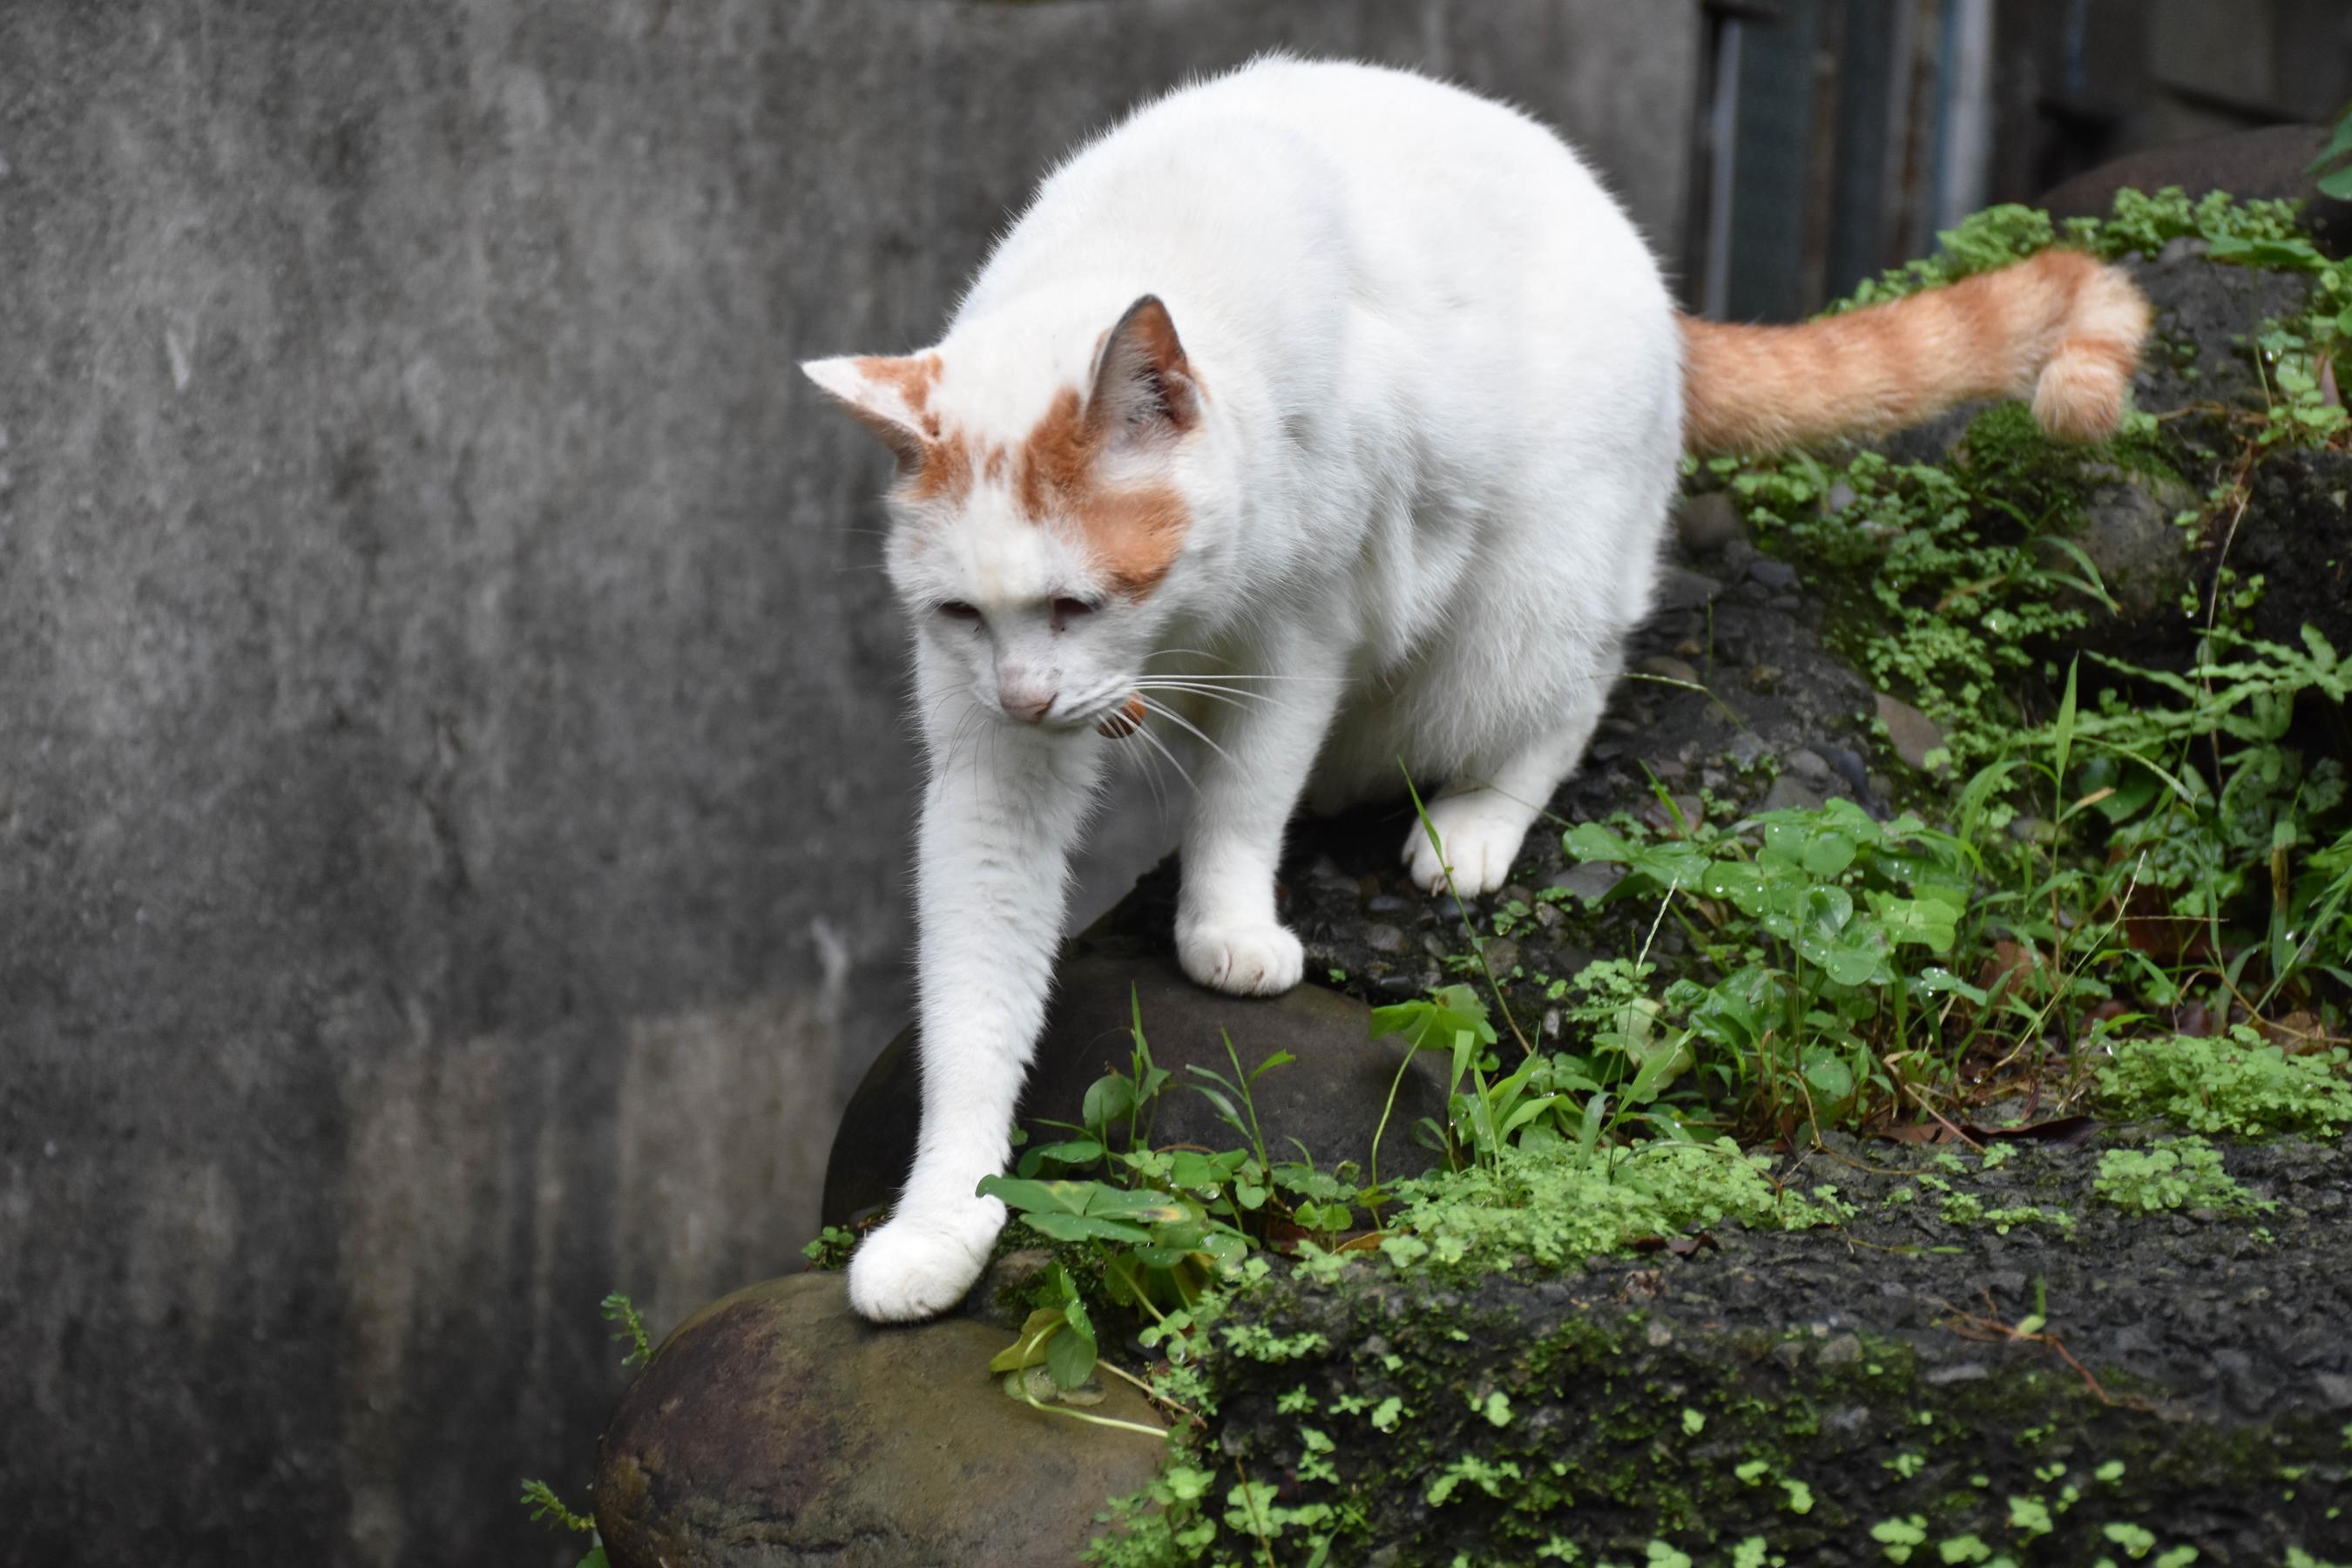 cat_26940718319_o